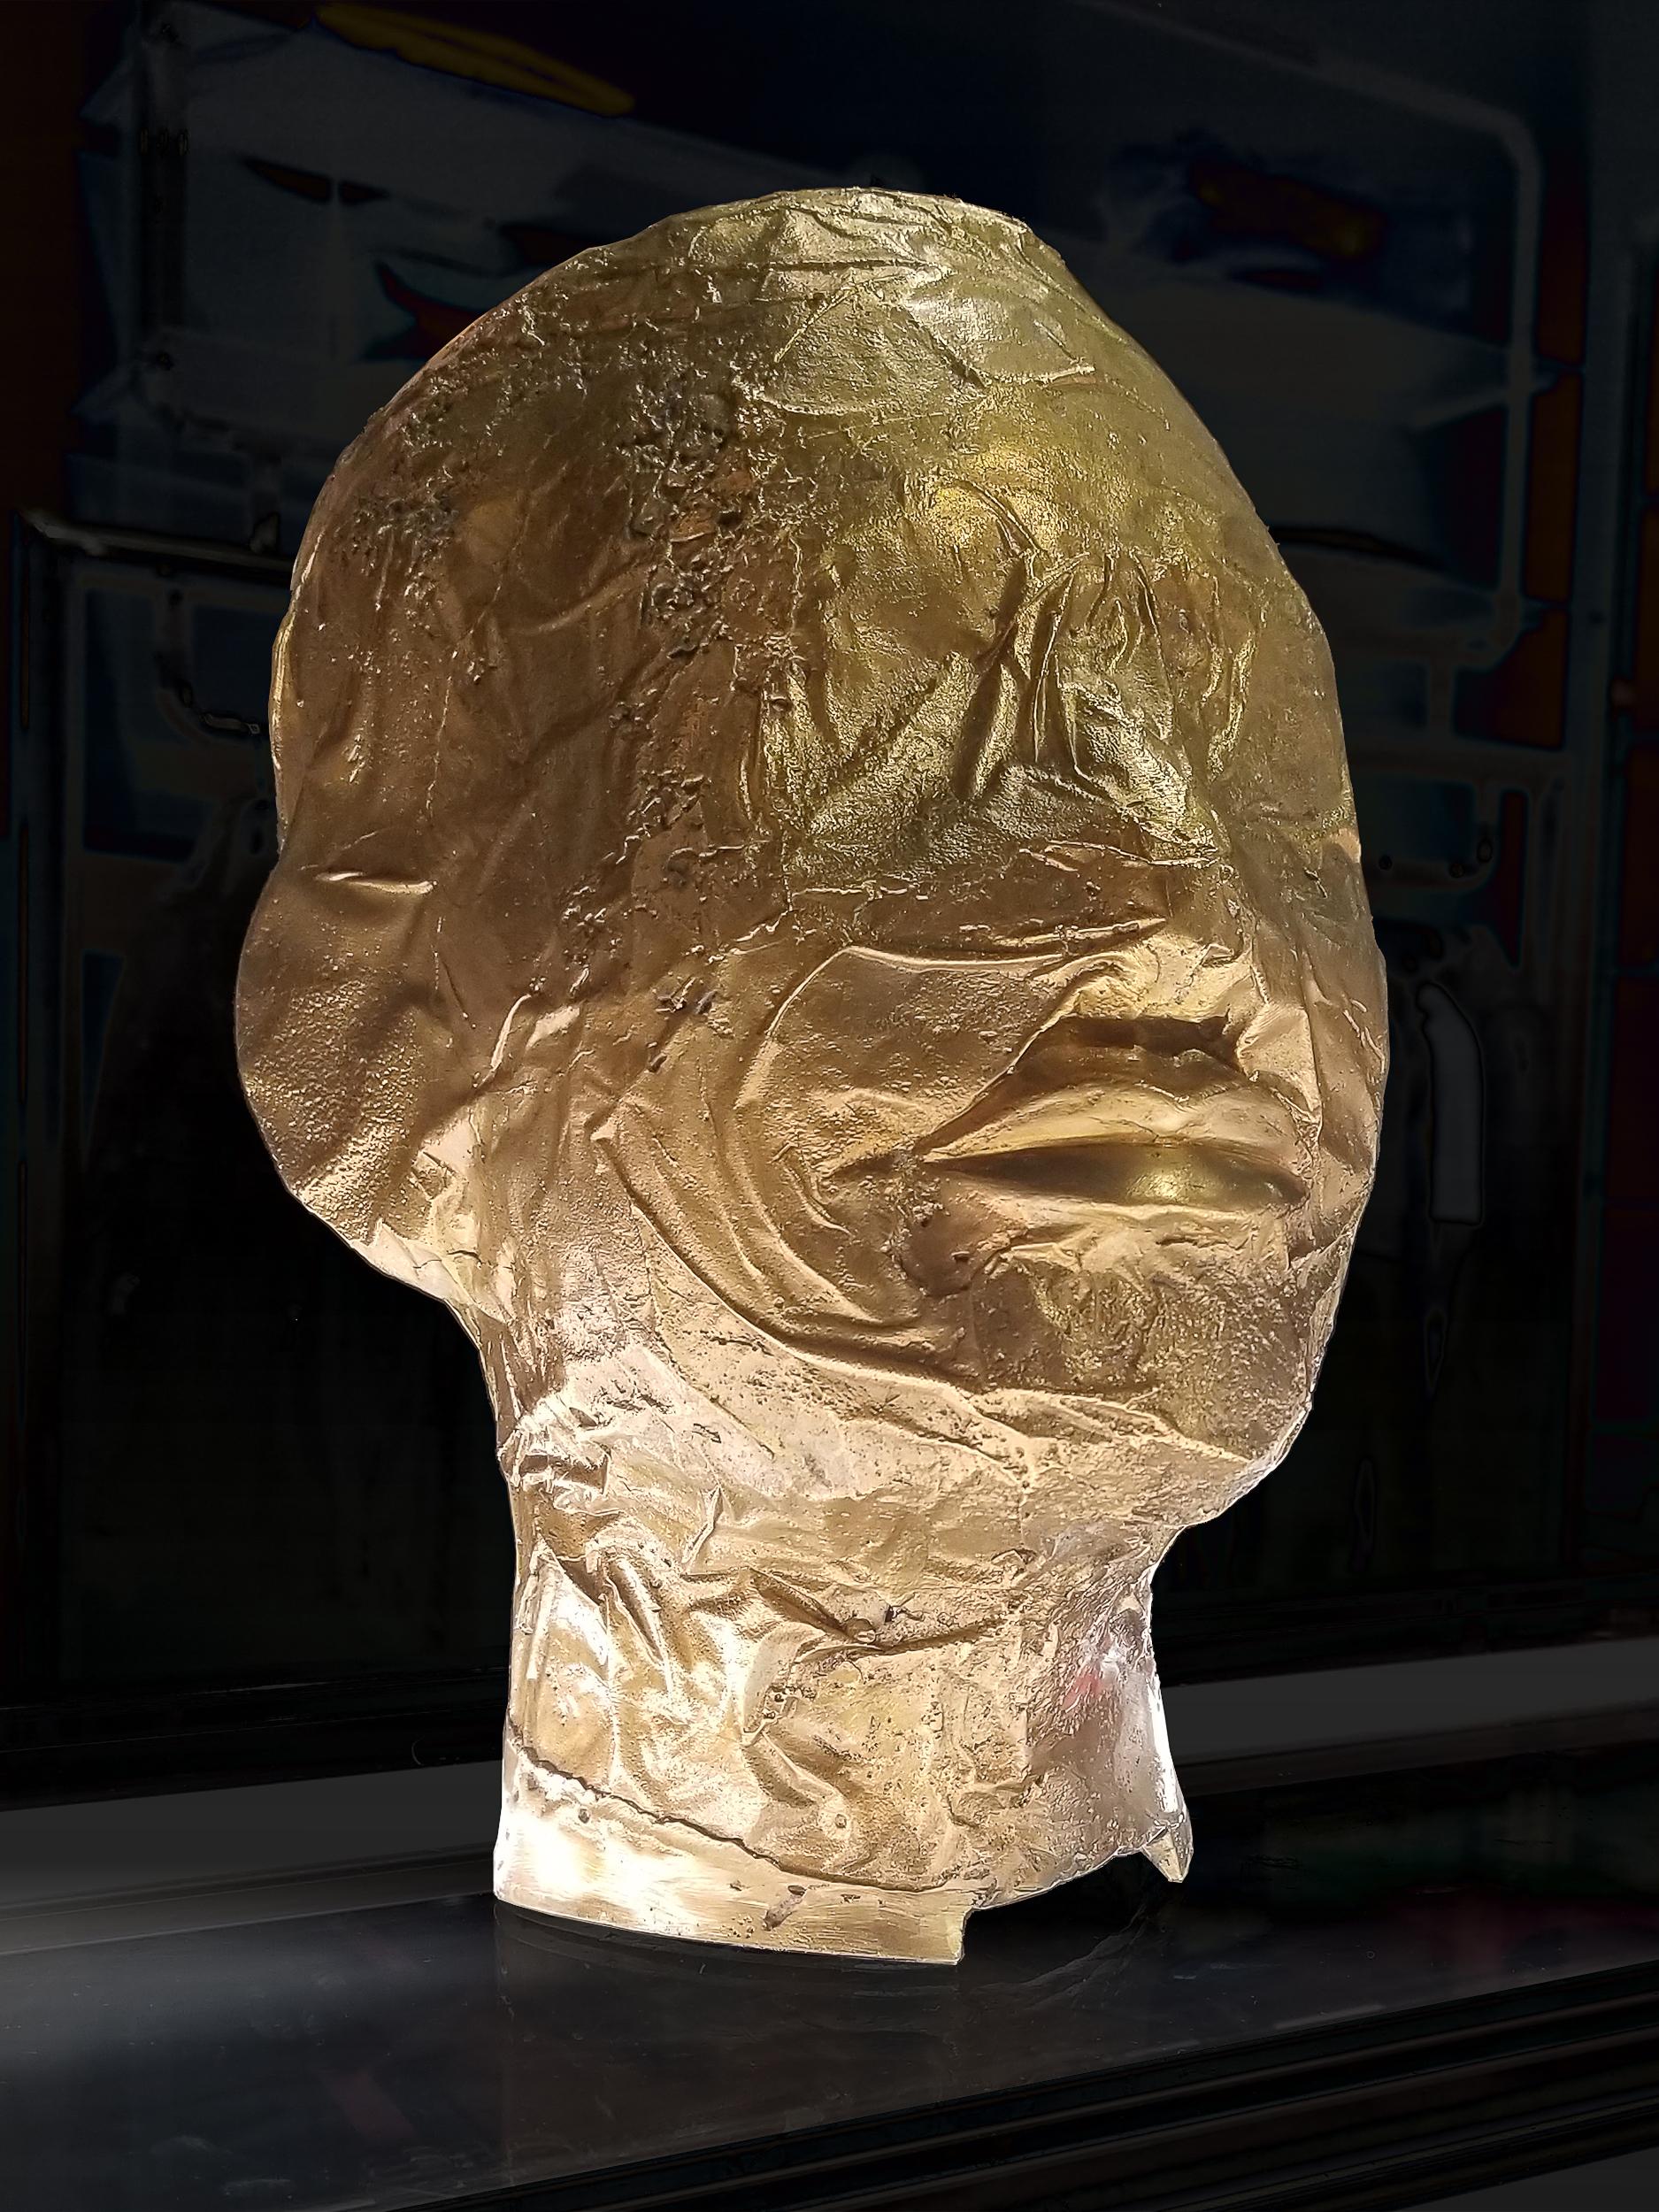 benoit-izard_head_bronze_2018_13X9X9inches__HD.jpg